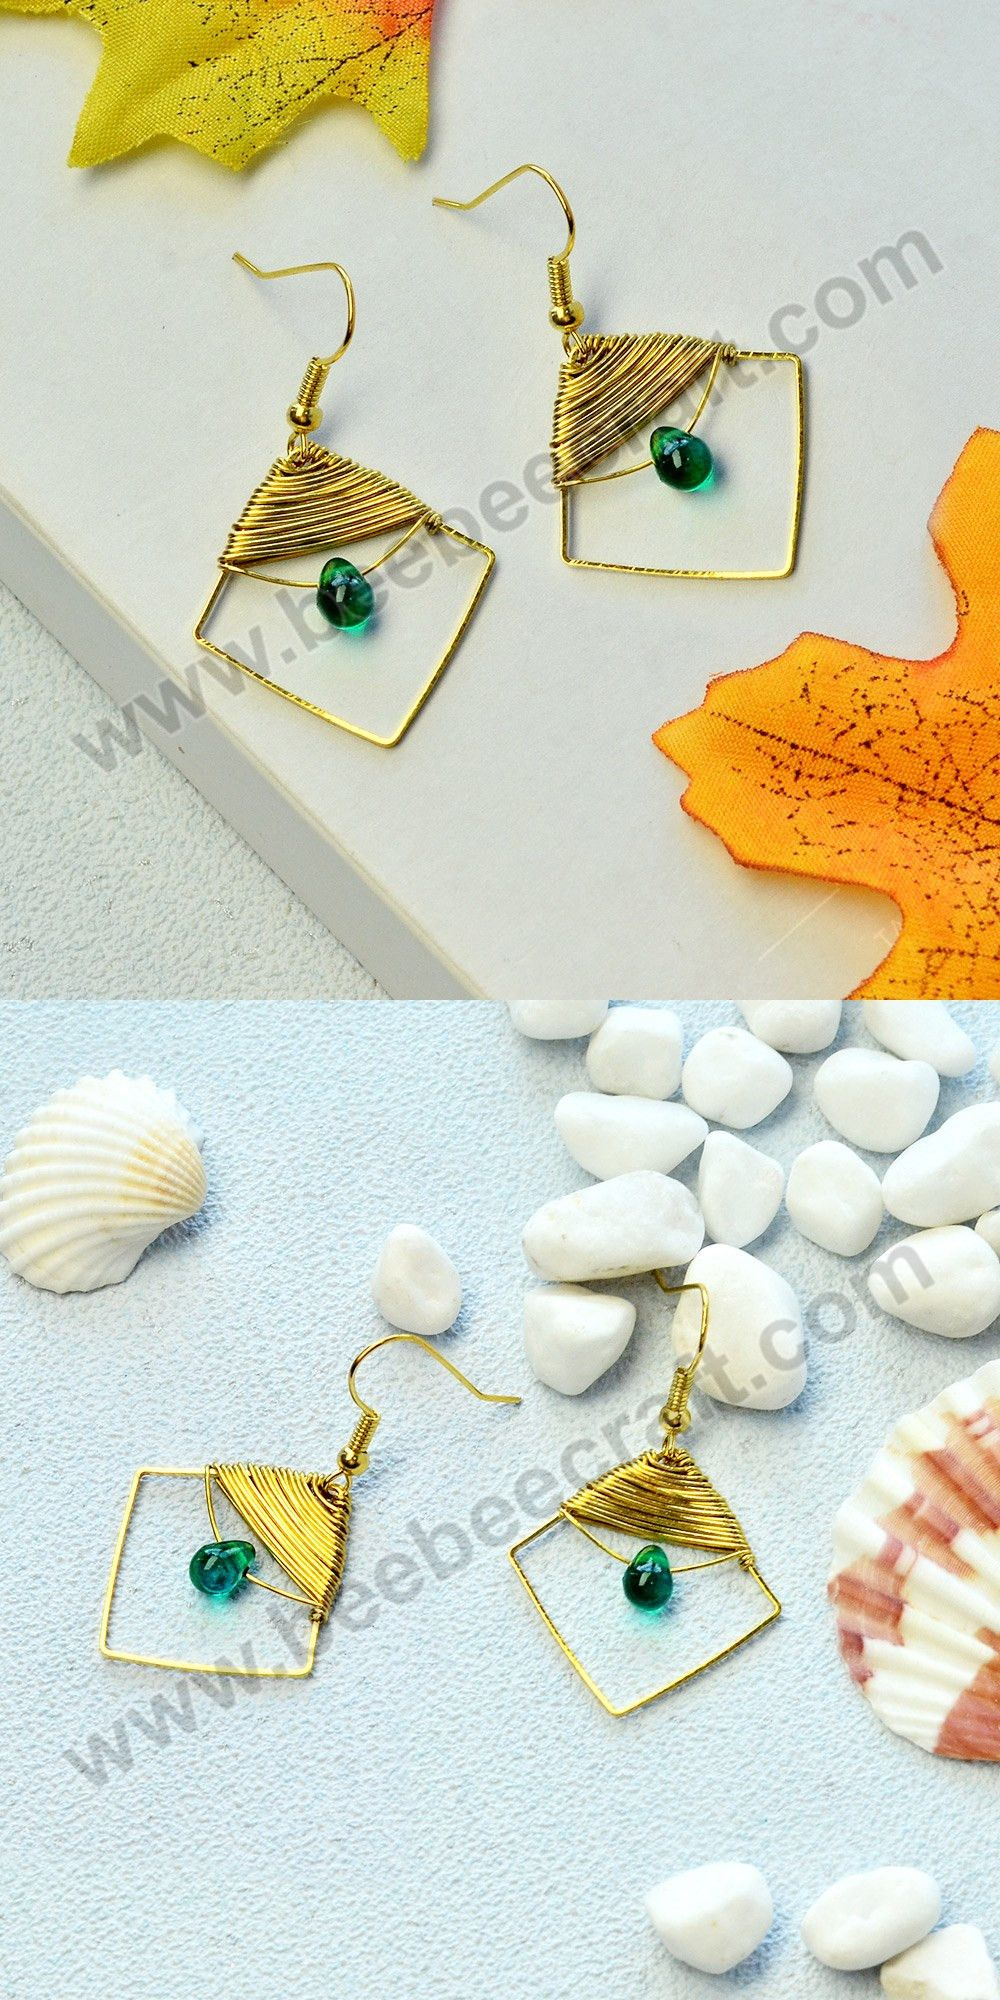 Handmade earrings with beebeecraft beading wire